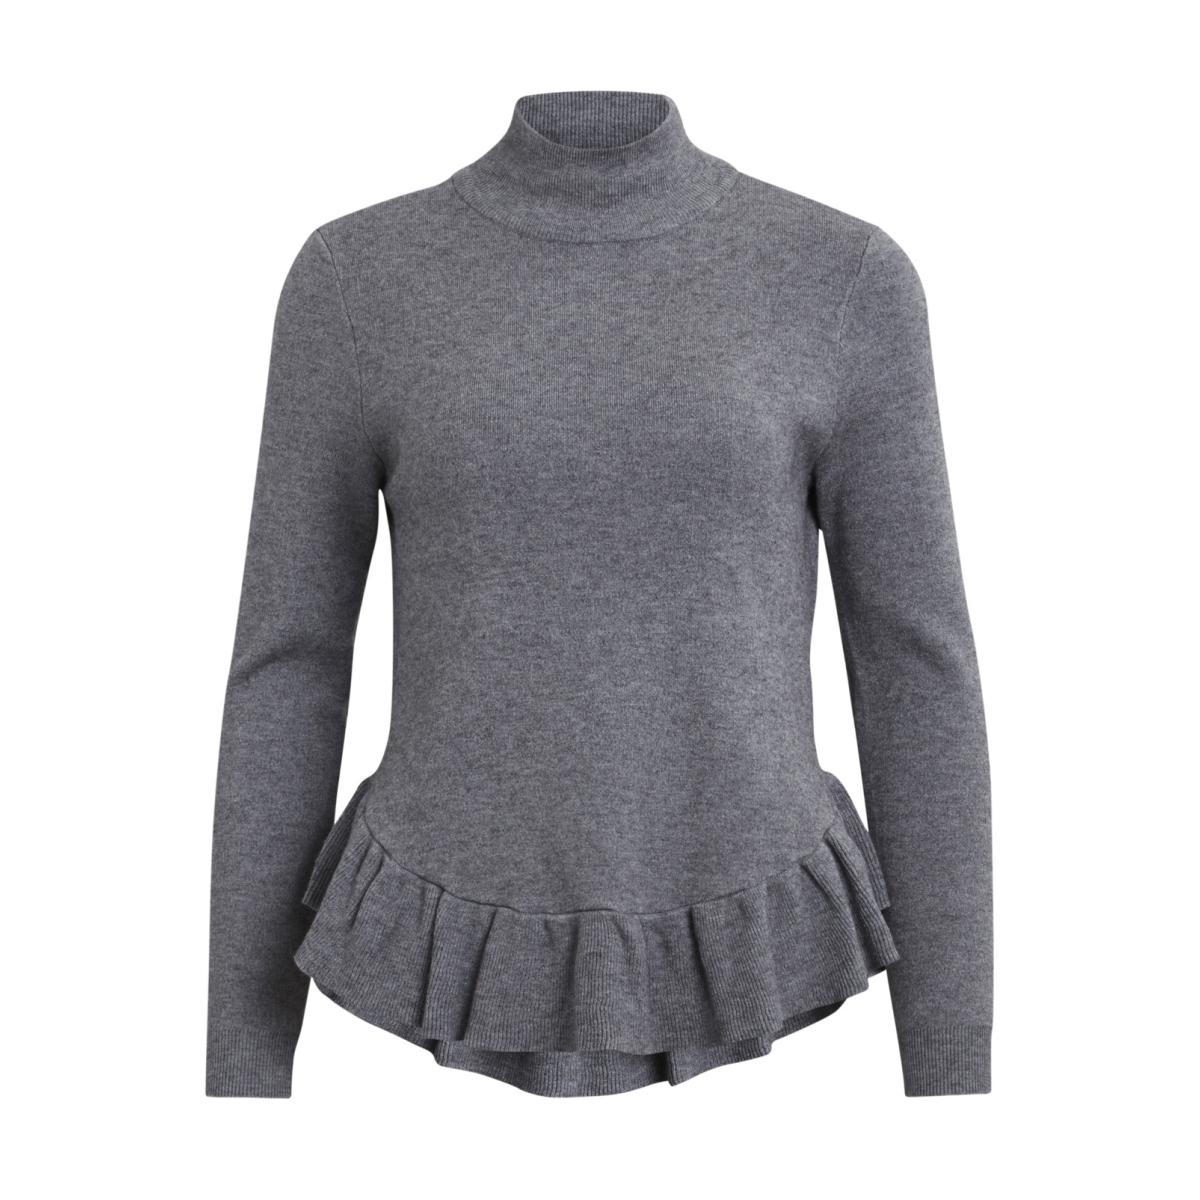 objcarin l/s knit pullover 92 23024872 object trui medium grey melange